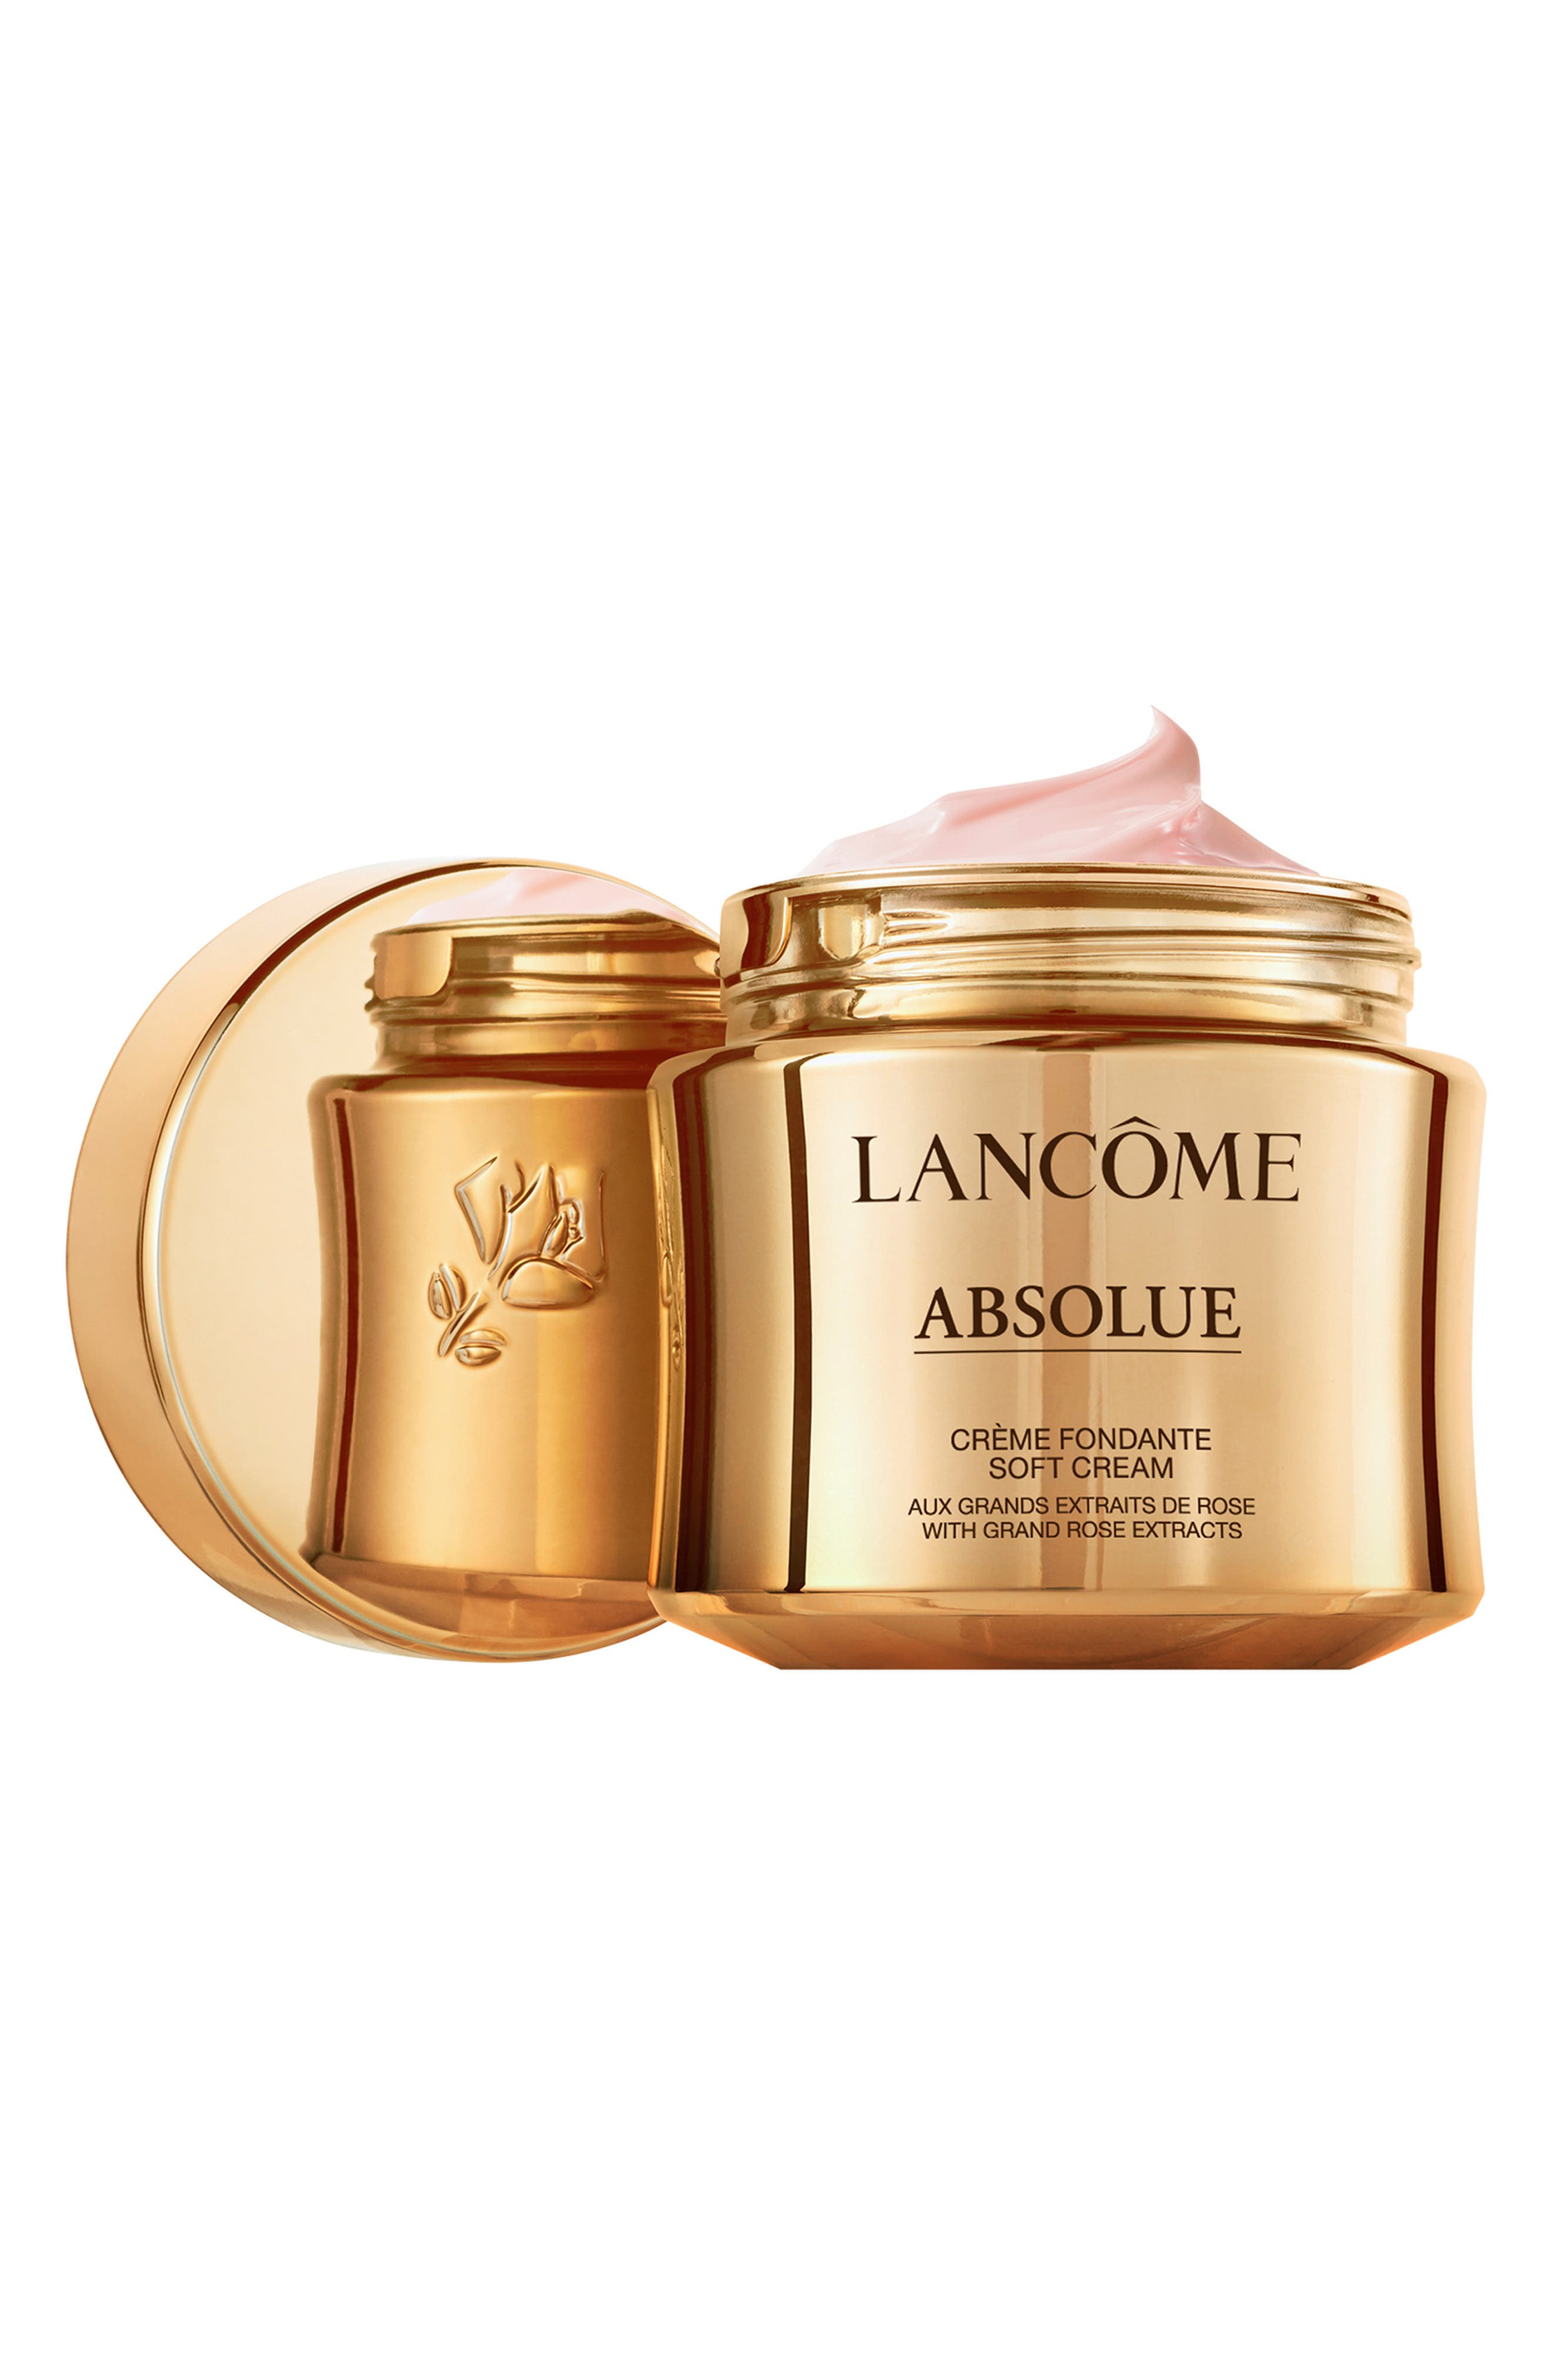 Lancome Absolue Revitalizing & Brightening Soft Cream, oz